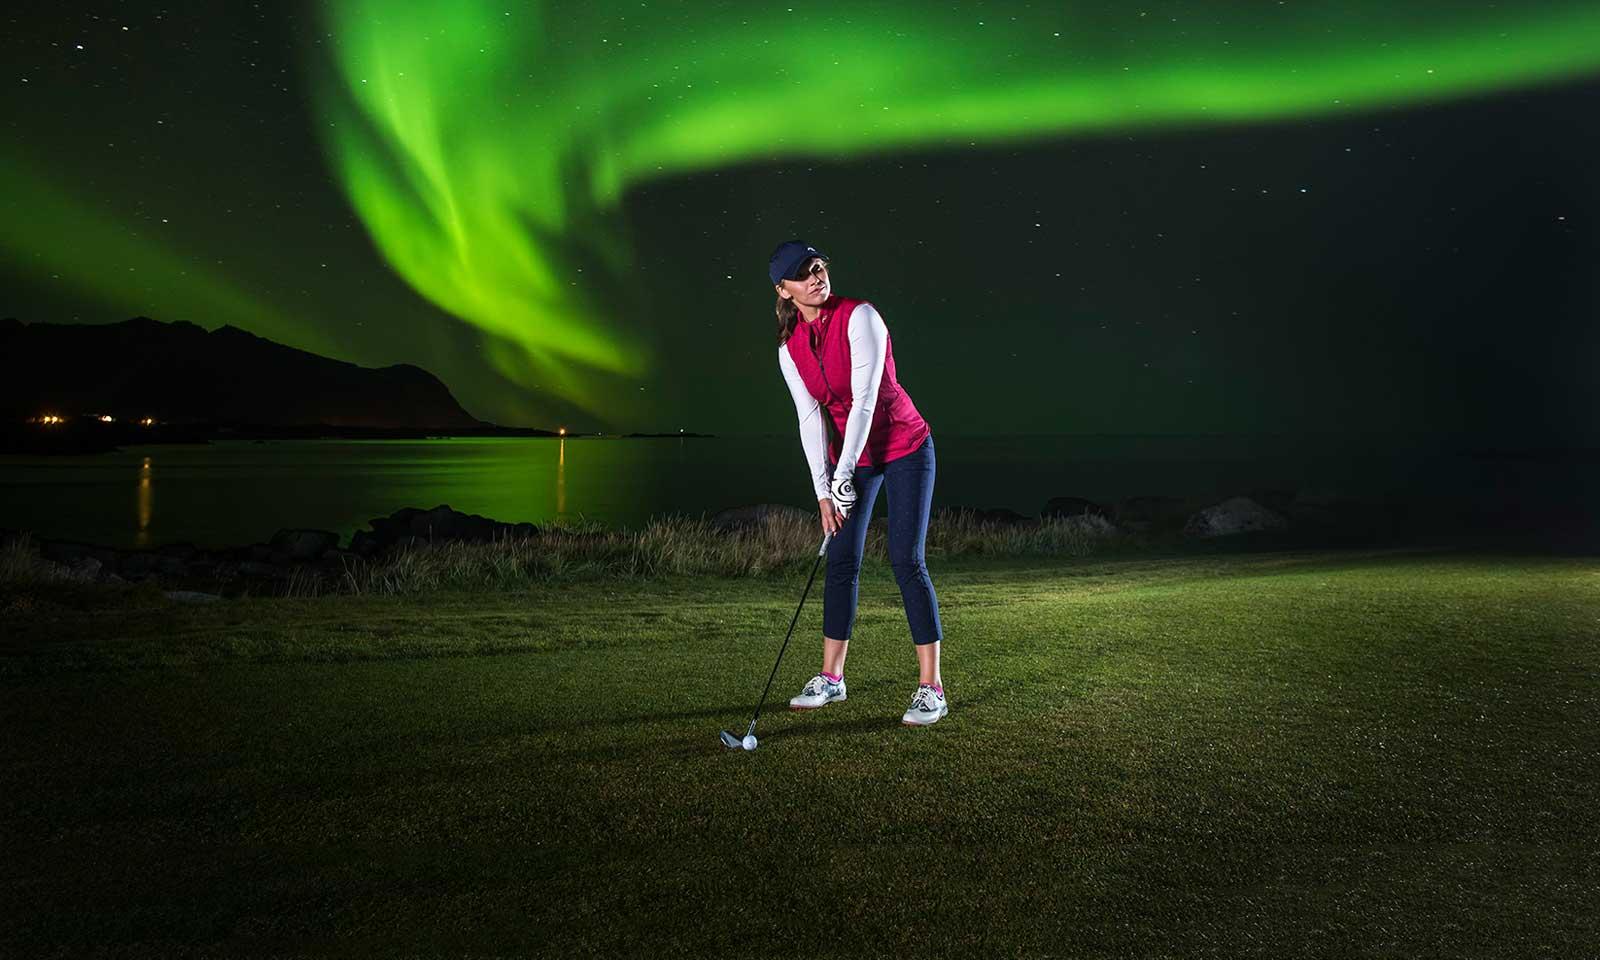 Golf Under the Northern Lights